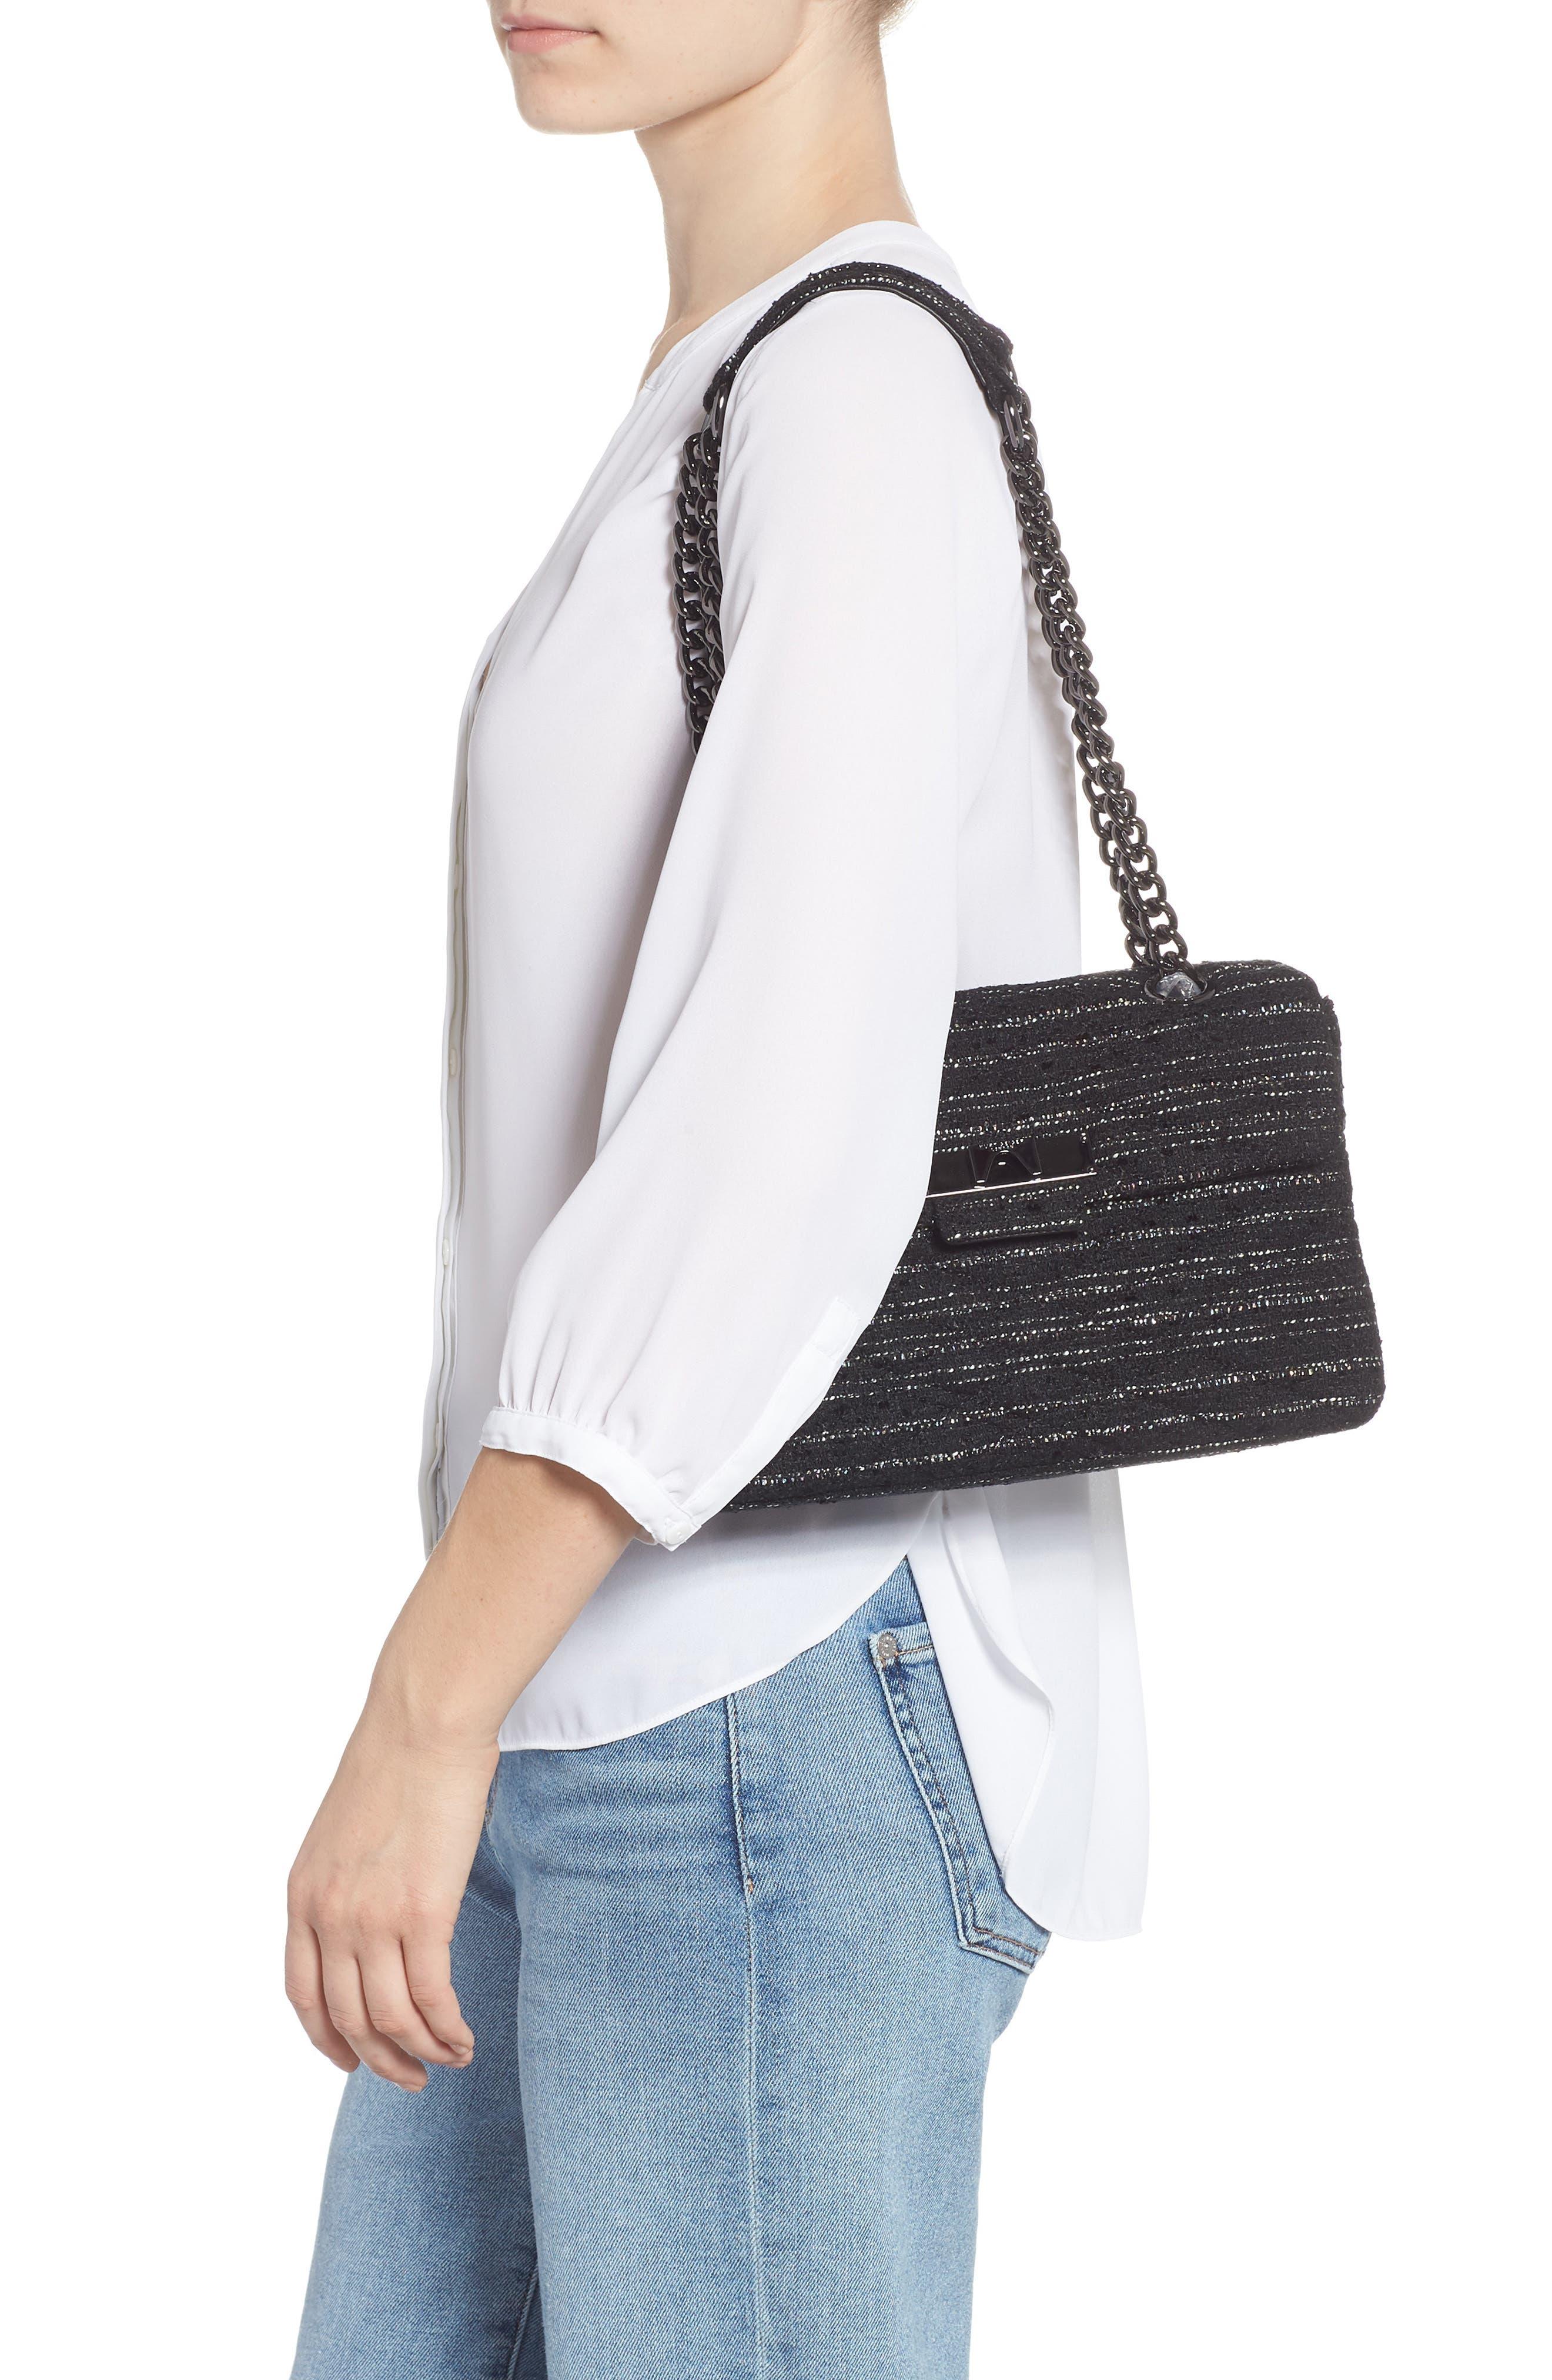 Mayfair Quilted Tweed Shoulder Bag,                             Alternate thumbnail 2, color,                             BLACK